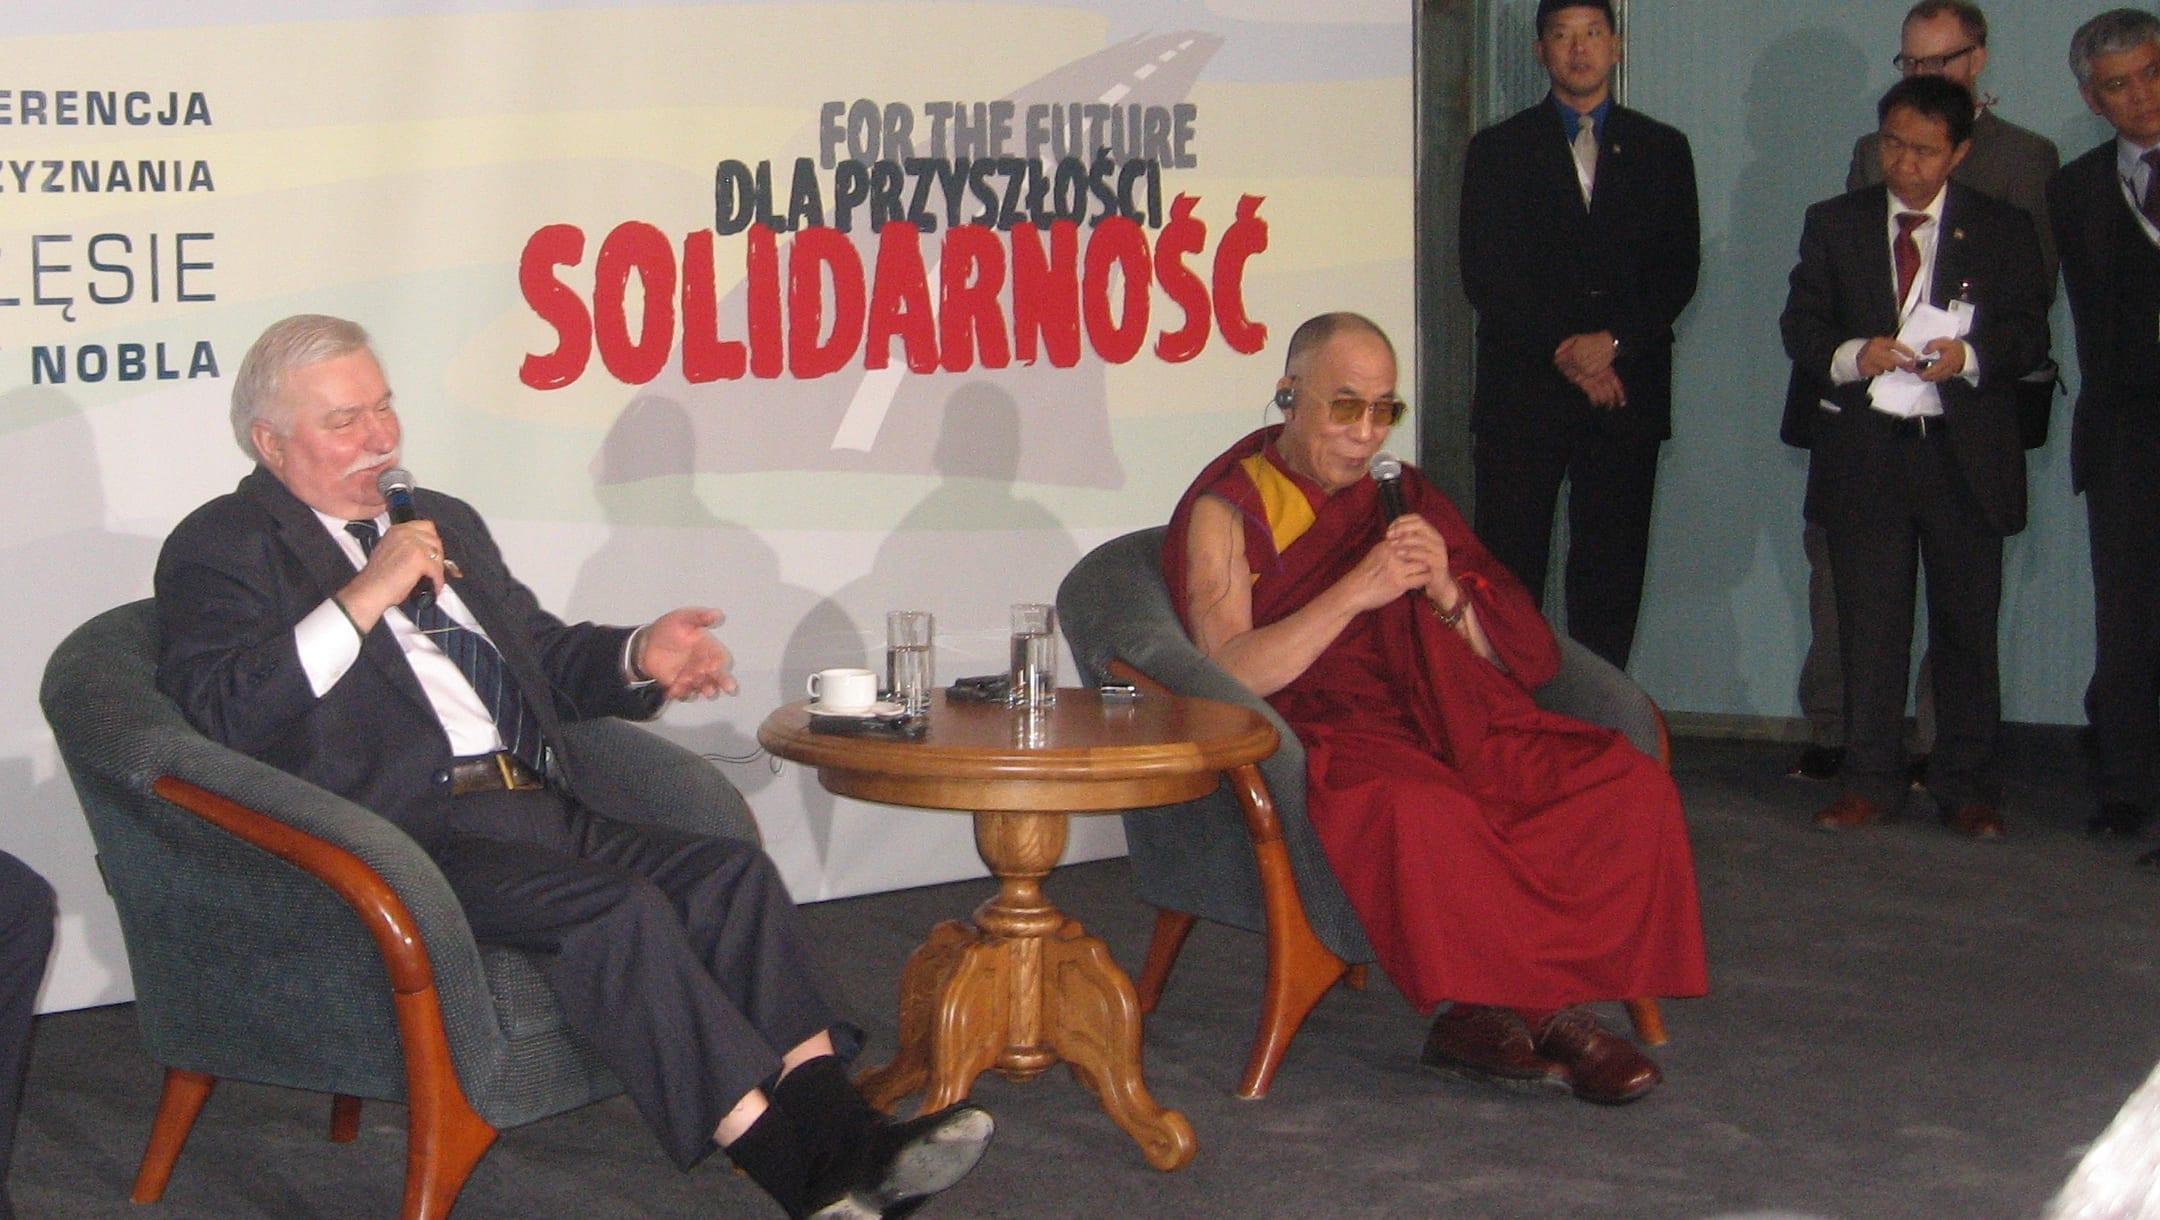 gdansk_lech_walesa_og_dalai_lama_polennu